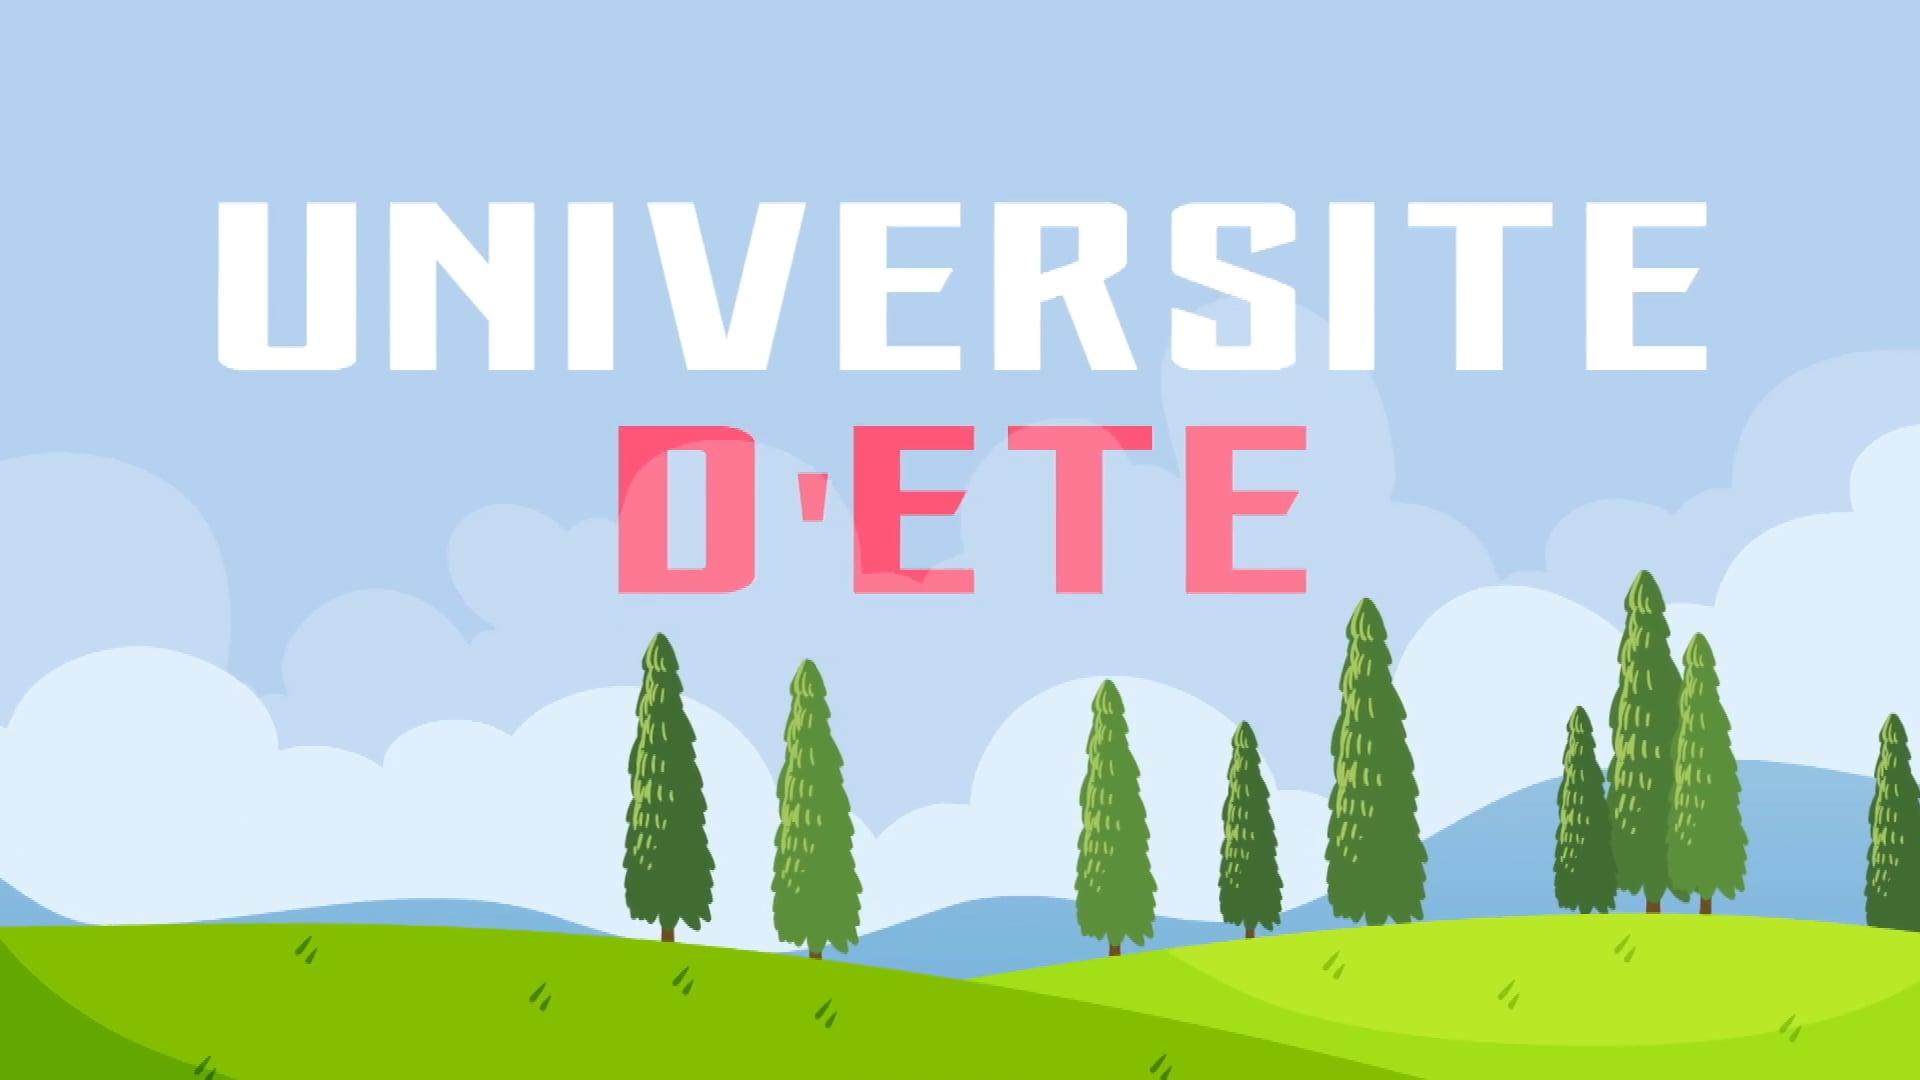 UNIVERSITE D'ETE